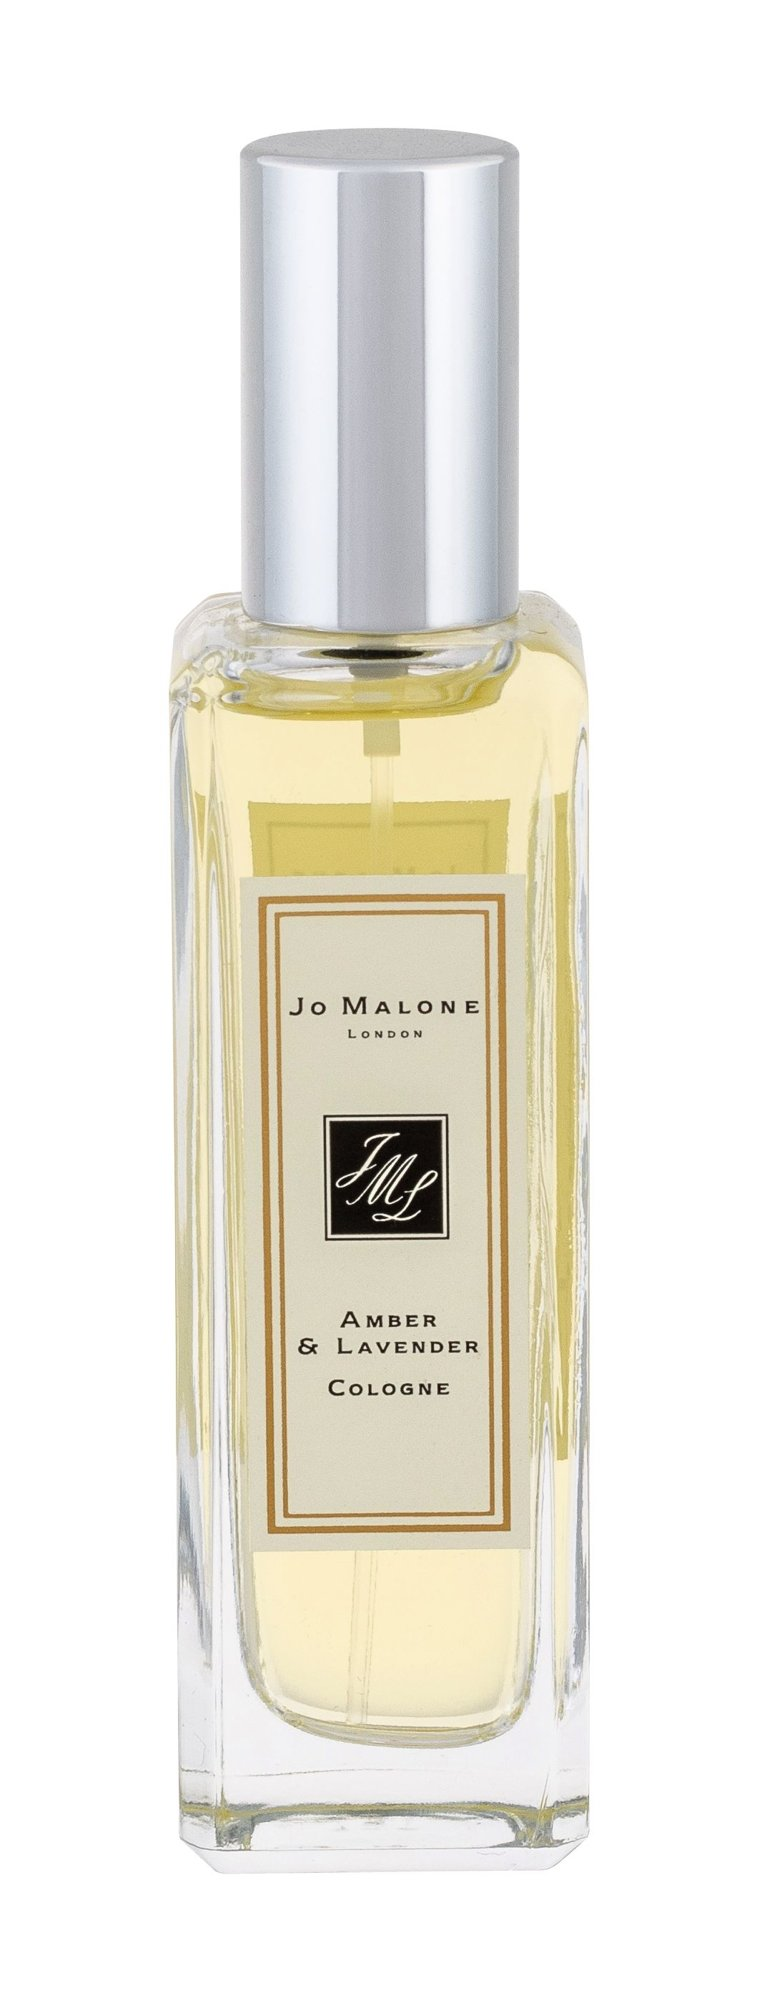 Jo Malone Amber & Lavender Eau de Cologne 30ml